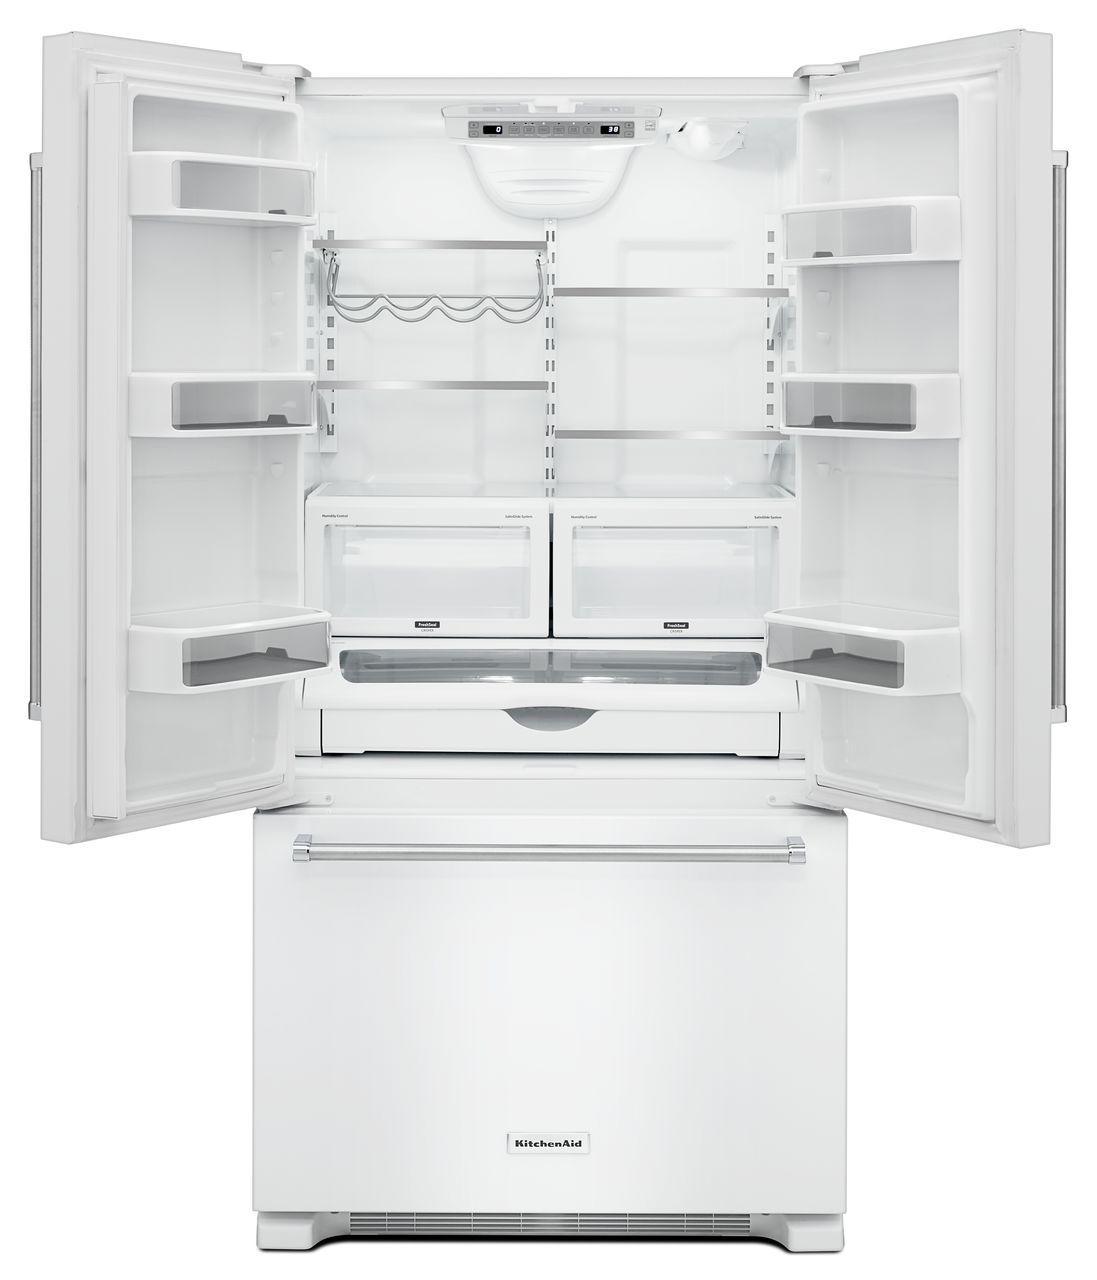 Kitchenaid Black Counter Depth Refrigerator: Bottom Freezer Refrigerators